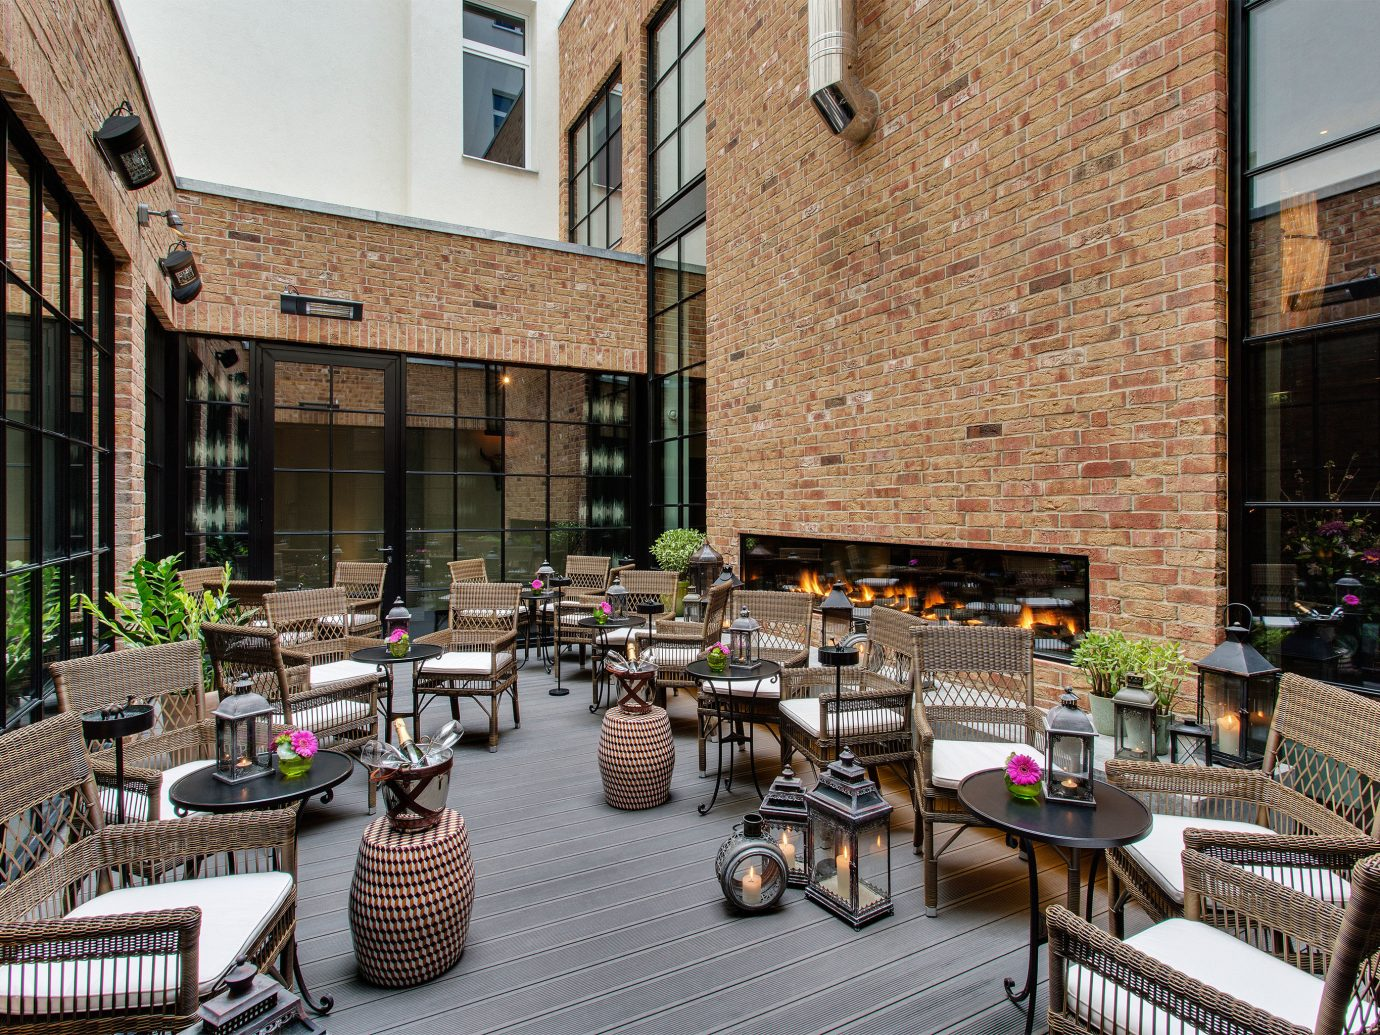 Berlin Boutique Hotels Germany Hotels Luxury Travel building property outdoor neighbourhood Courtyard restaurant estate condominium plaza furniture